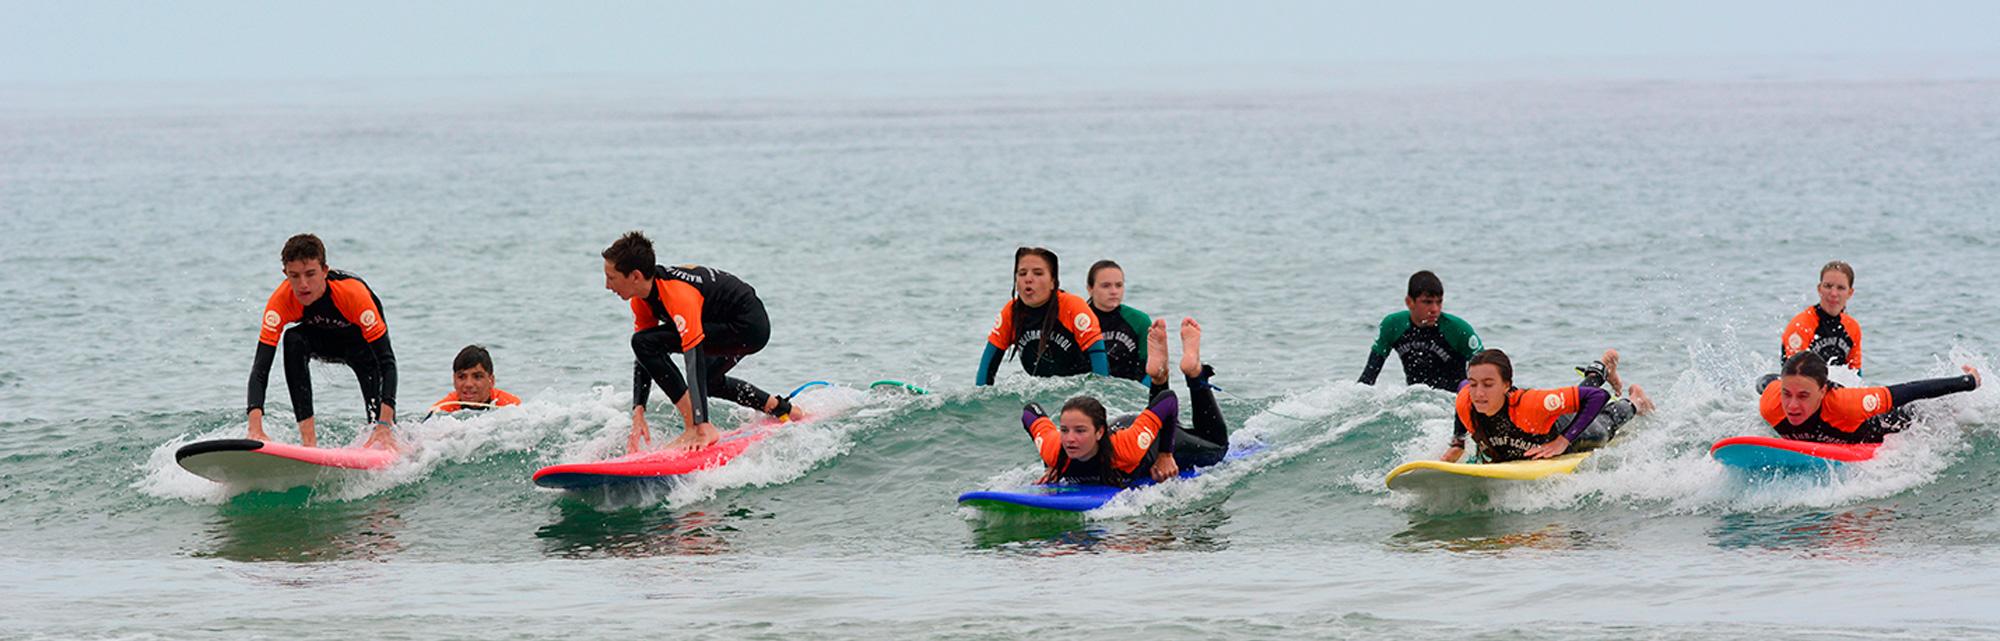 Campamentos de verano de surf cantabria